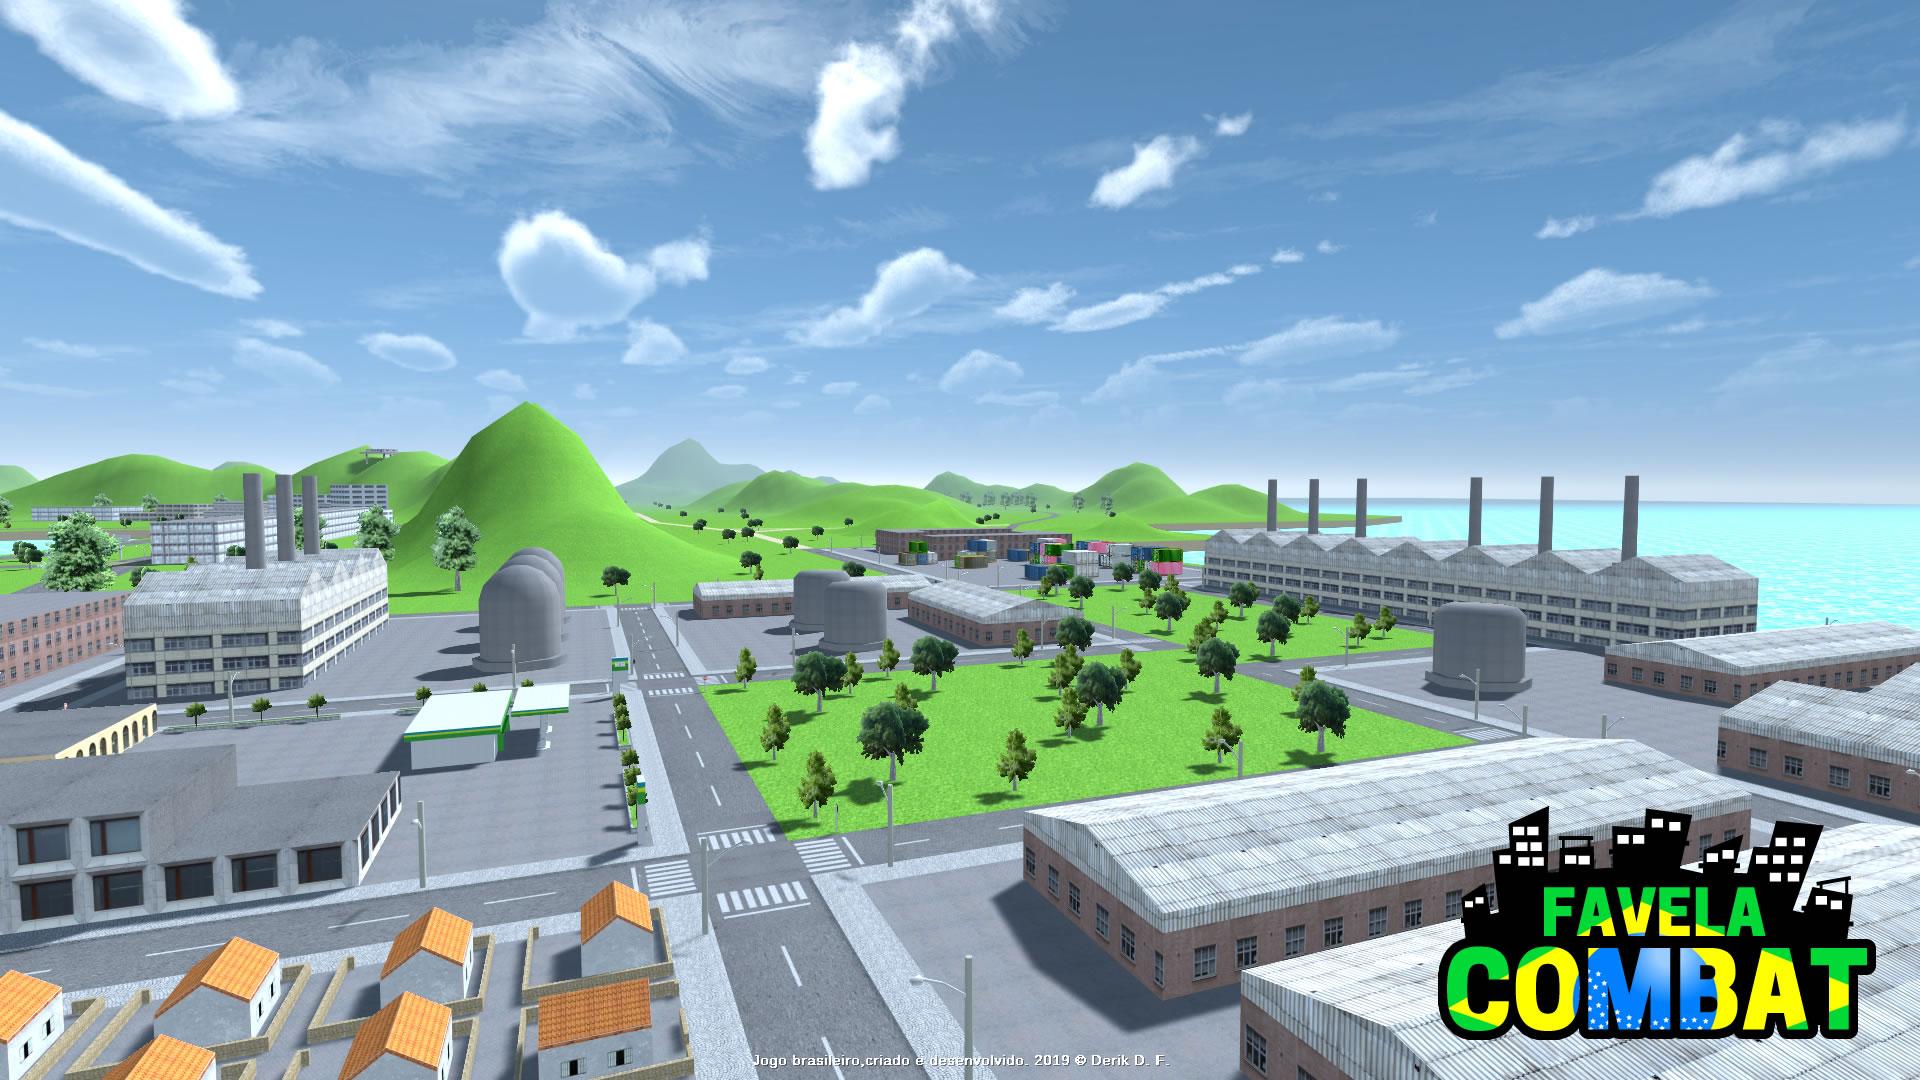 favela-combat-android-ios-03.jpg